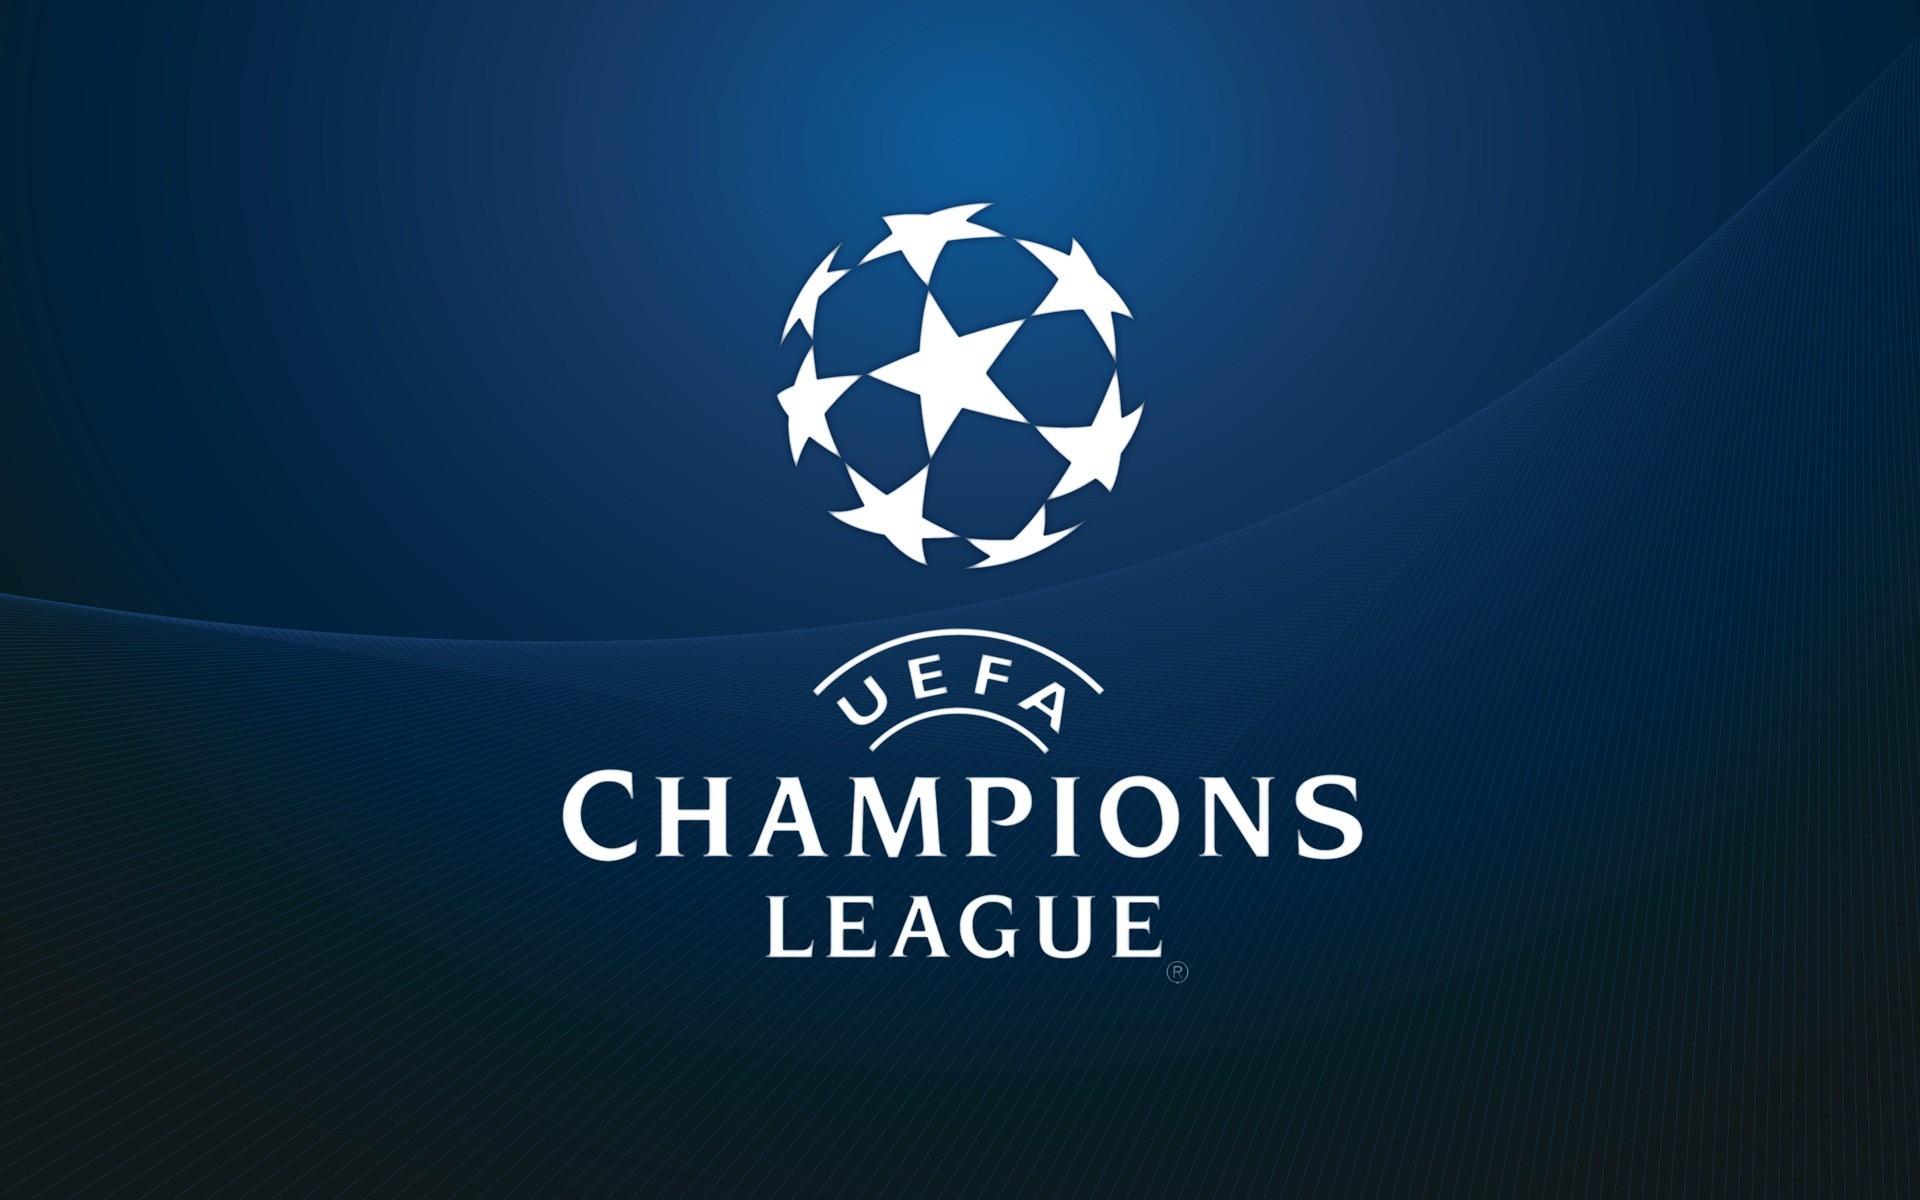 2014 Champions League Logo wallpaper